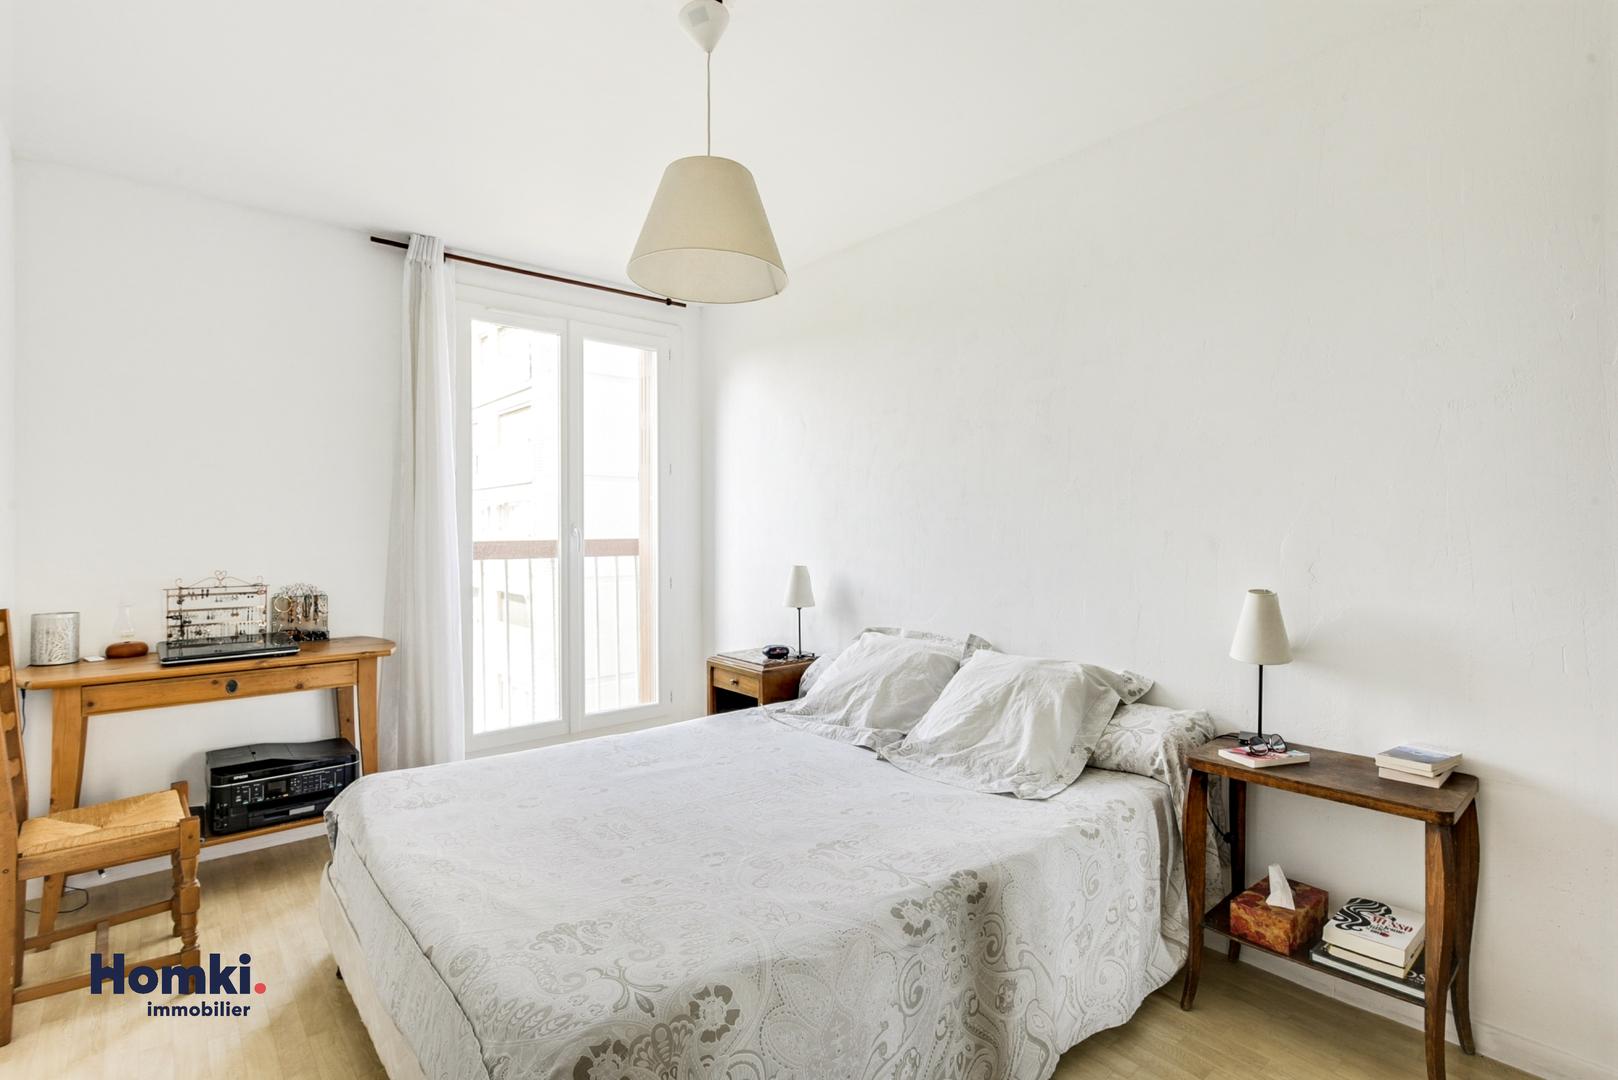 Vente appartement MArseille 13010 T5_7